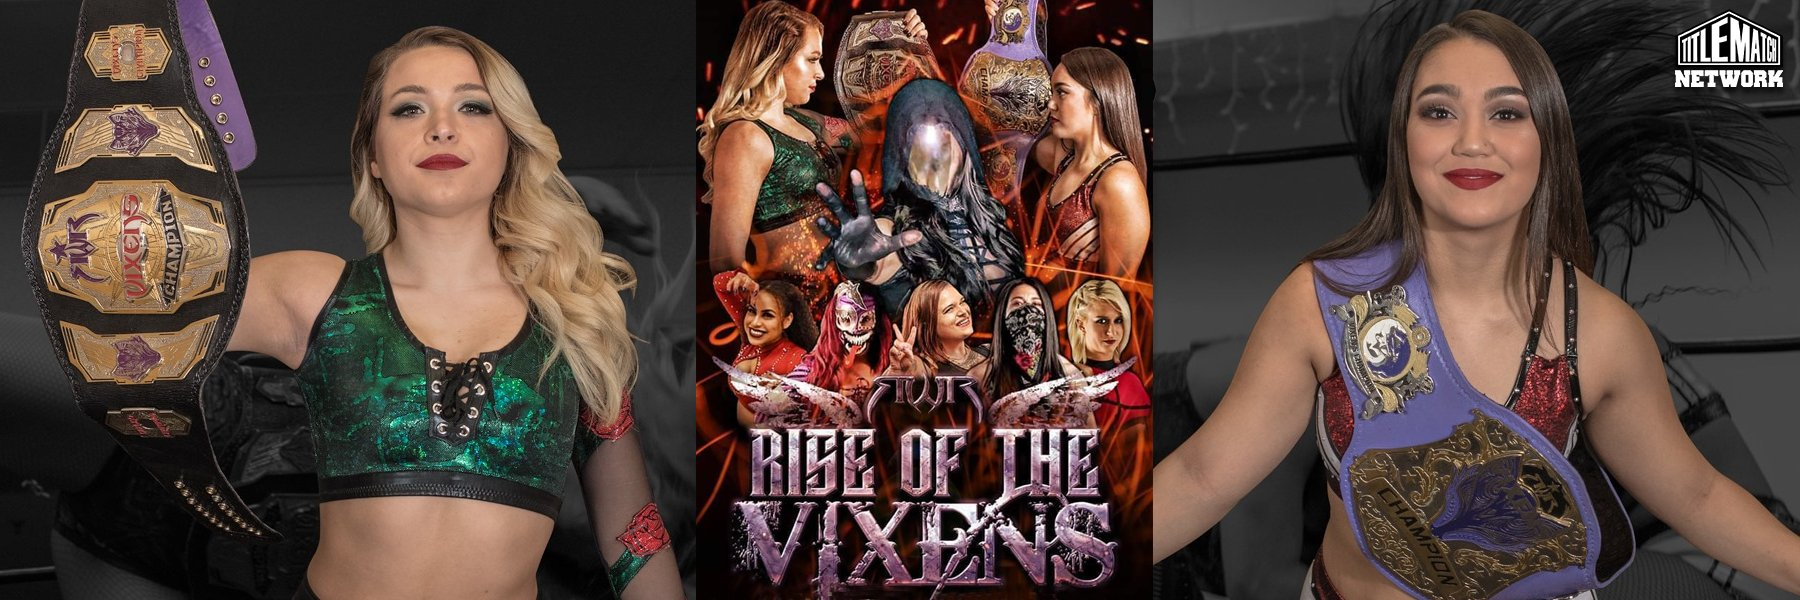 RWR: Rise of the Vixens 2.22.20 (Rok-C vs Raychell Rose vs Insidious One)